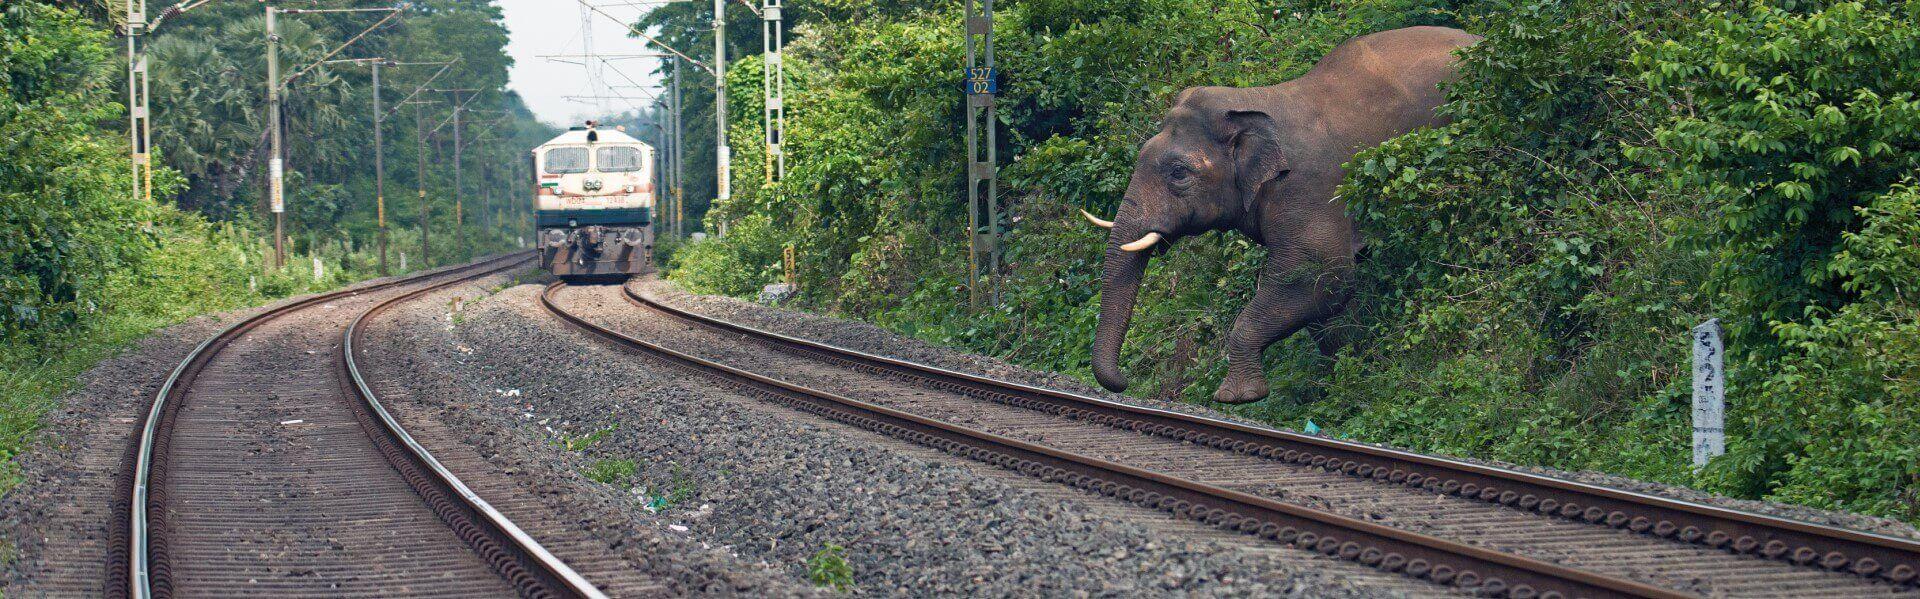 Asian Elephant Palakkad Kerala